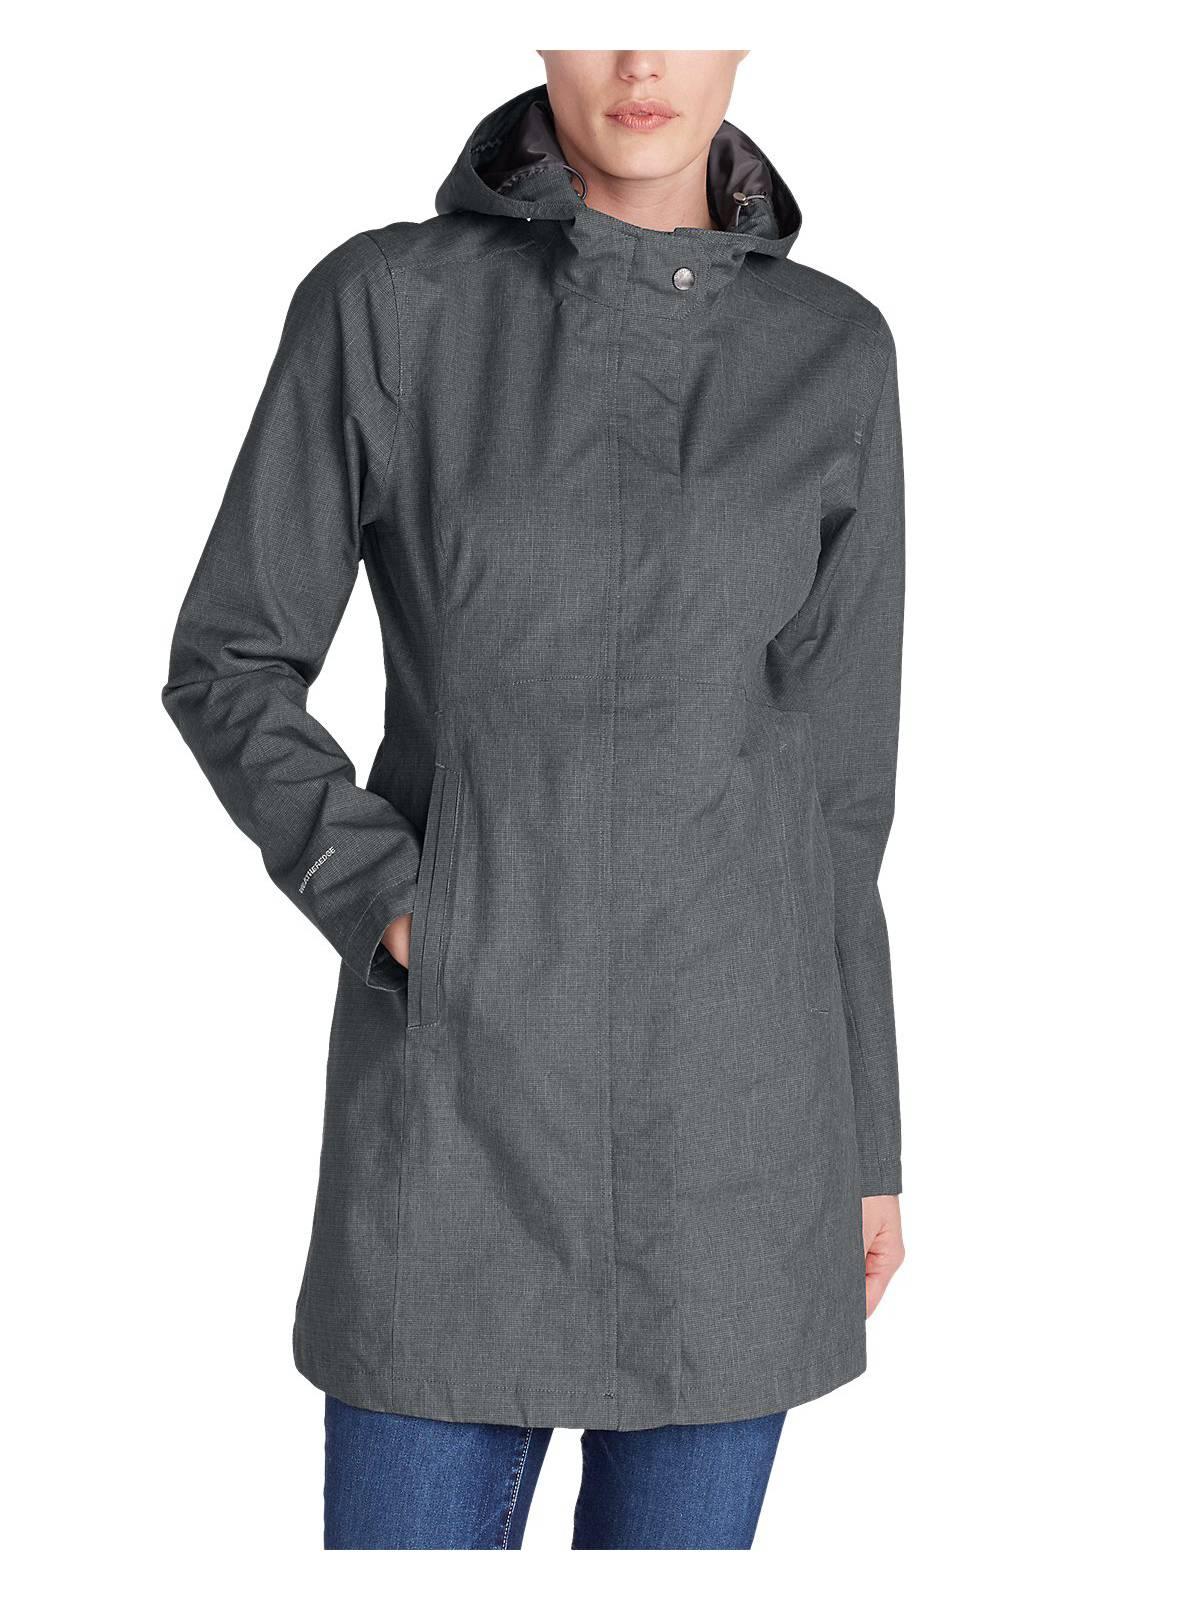 best prices offer discounts new varieties Details about Eddie Bauer Women's Mackenzie Trench Coat